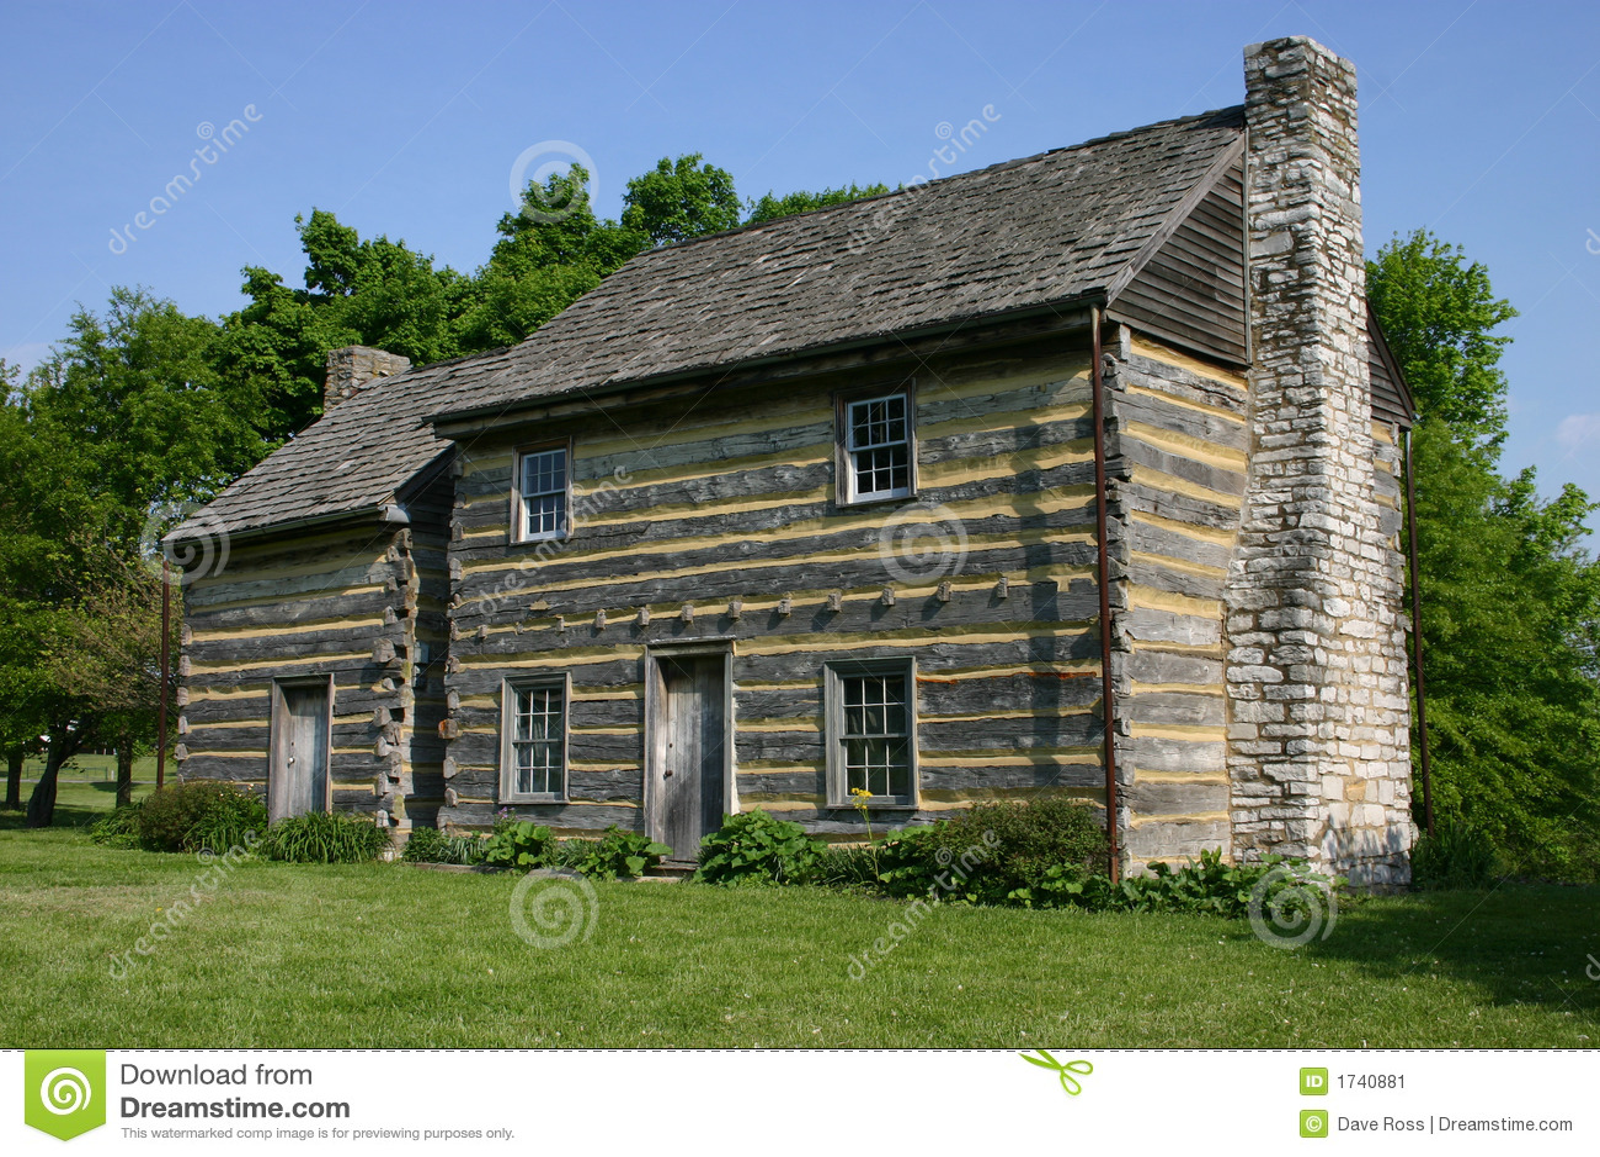 Log Cabin Stock Image Image 1740881